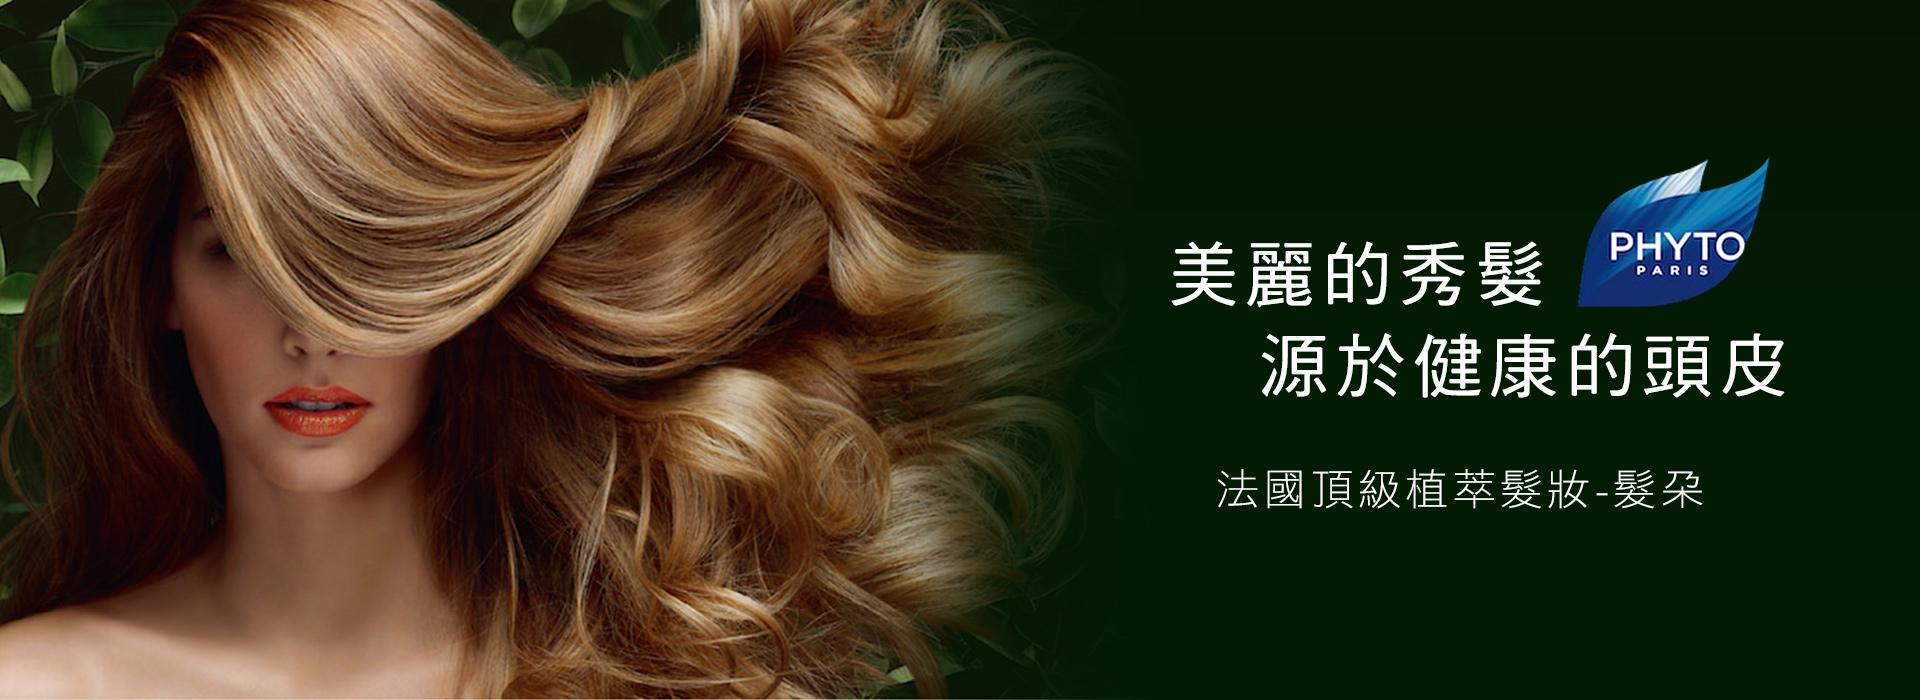 PHYTO 髮朵髮品